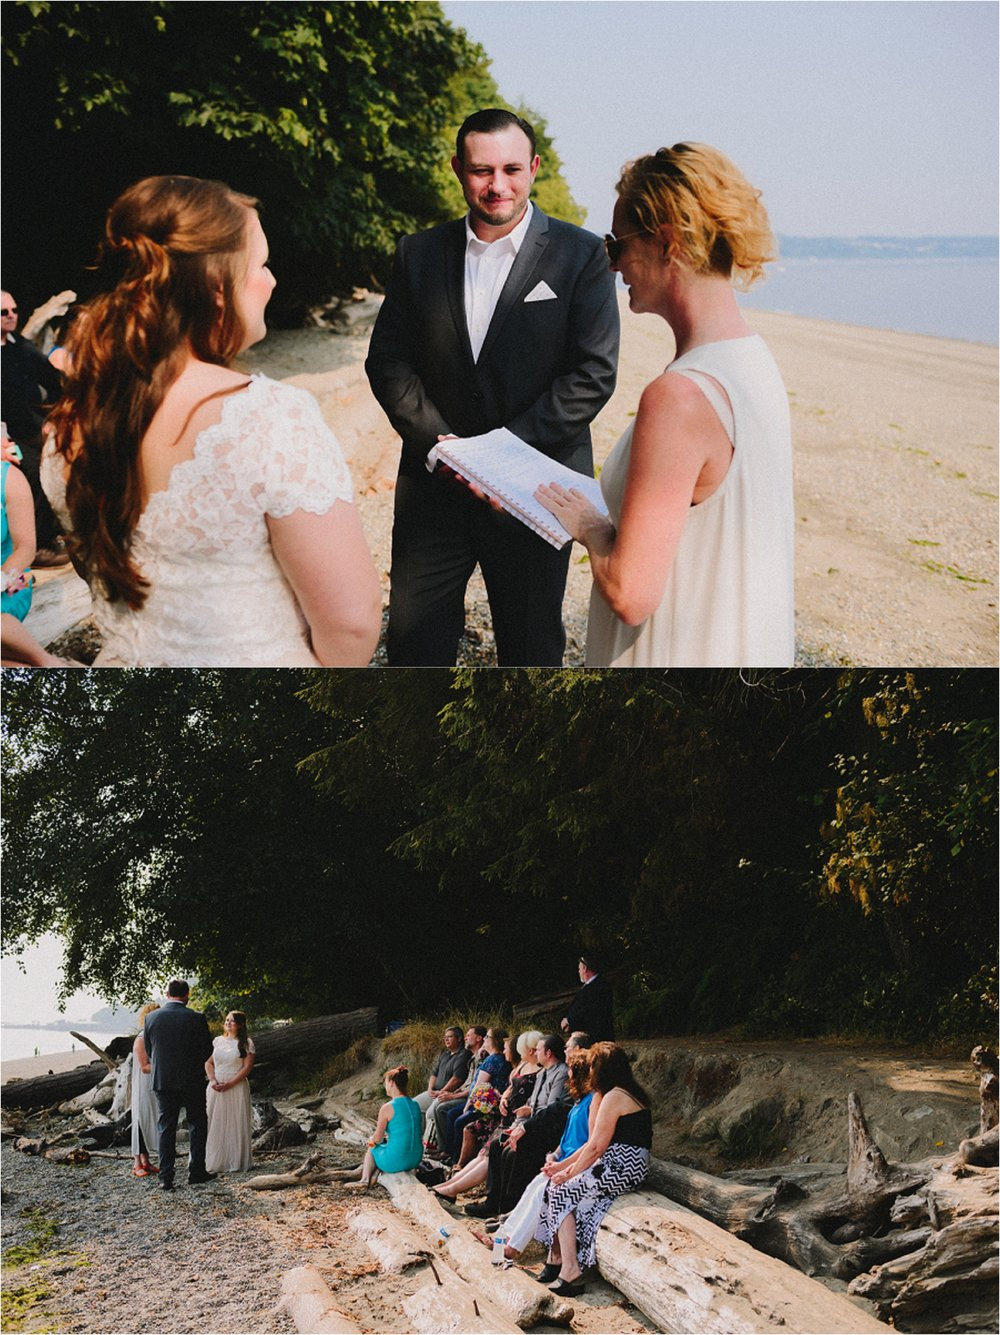 owen-beach-priest-point-park-tacoma-washington-elopement-jannicka-mayte-anchorage-alaska-wedding-elopement-photographer (35).jpg